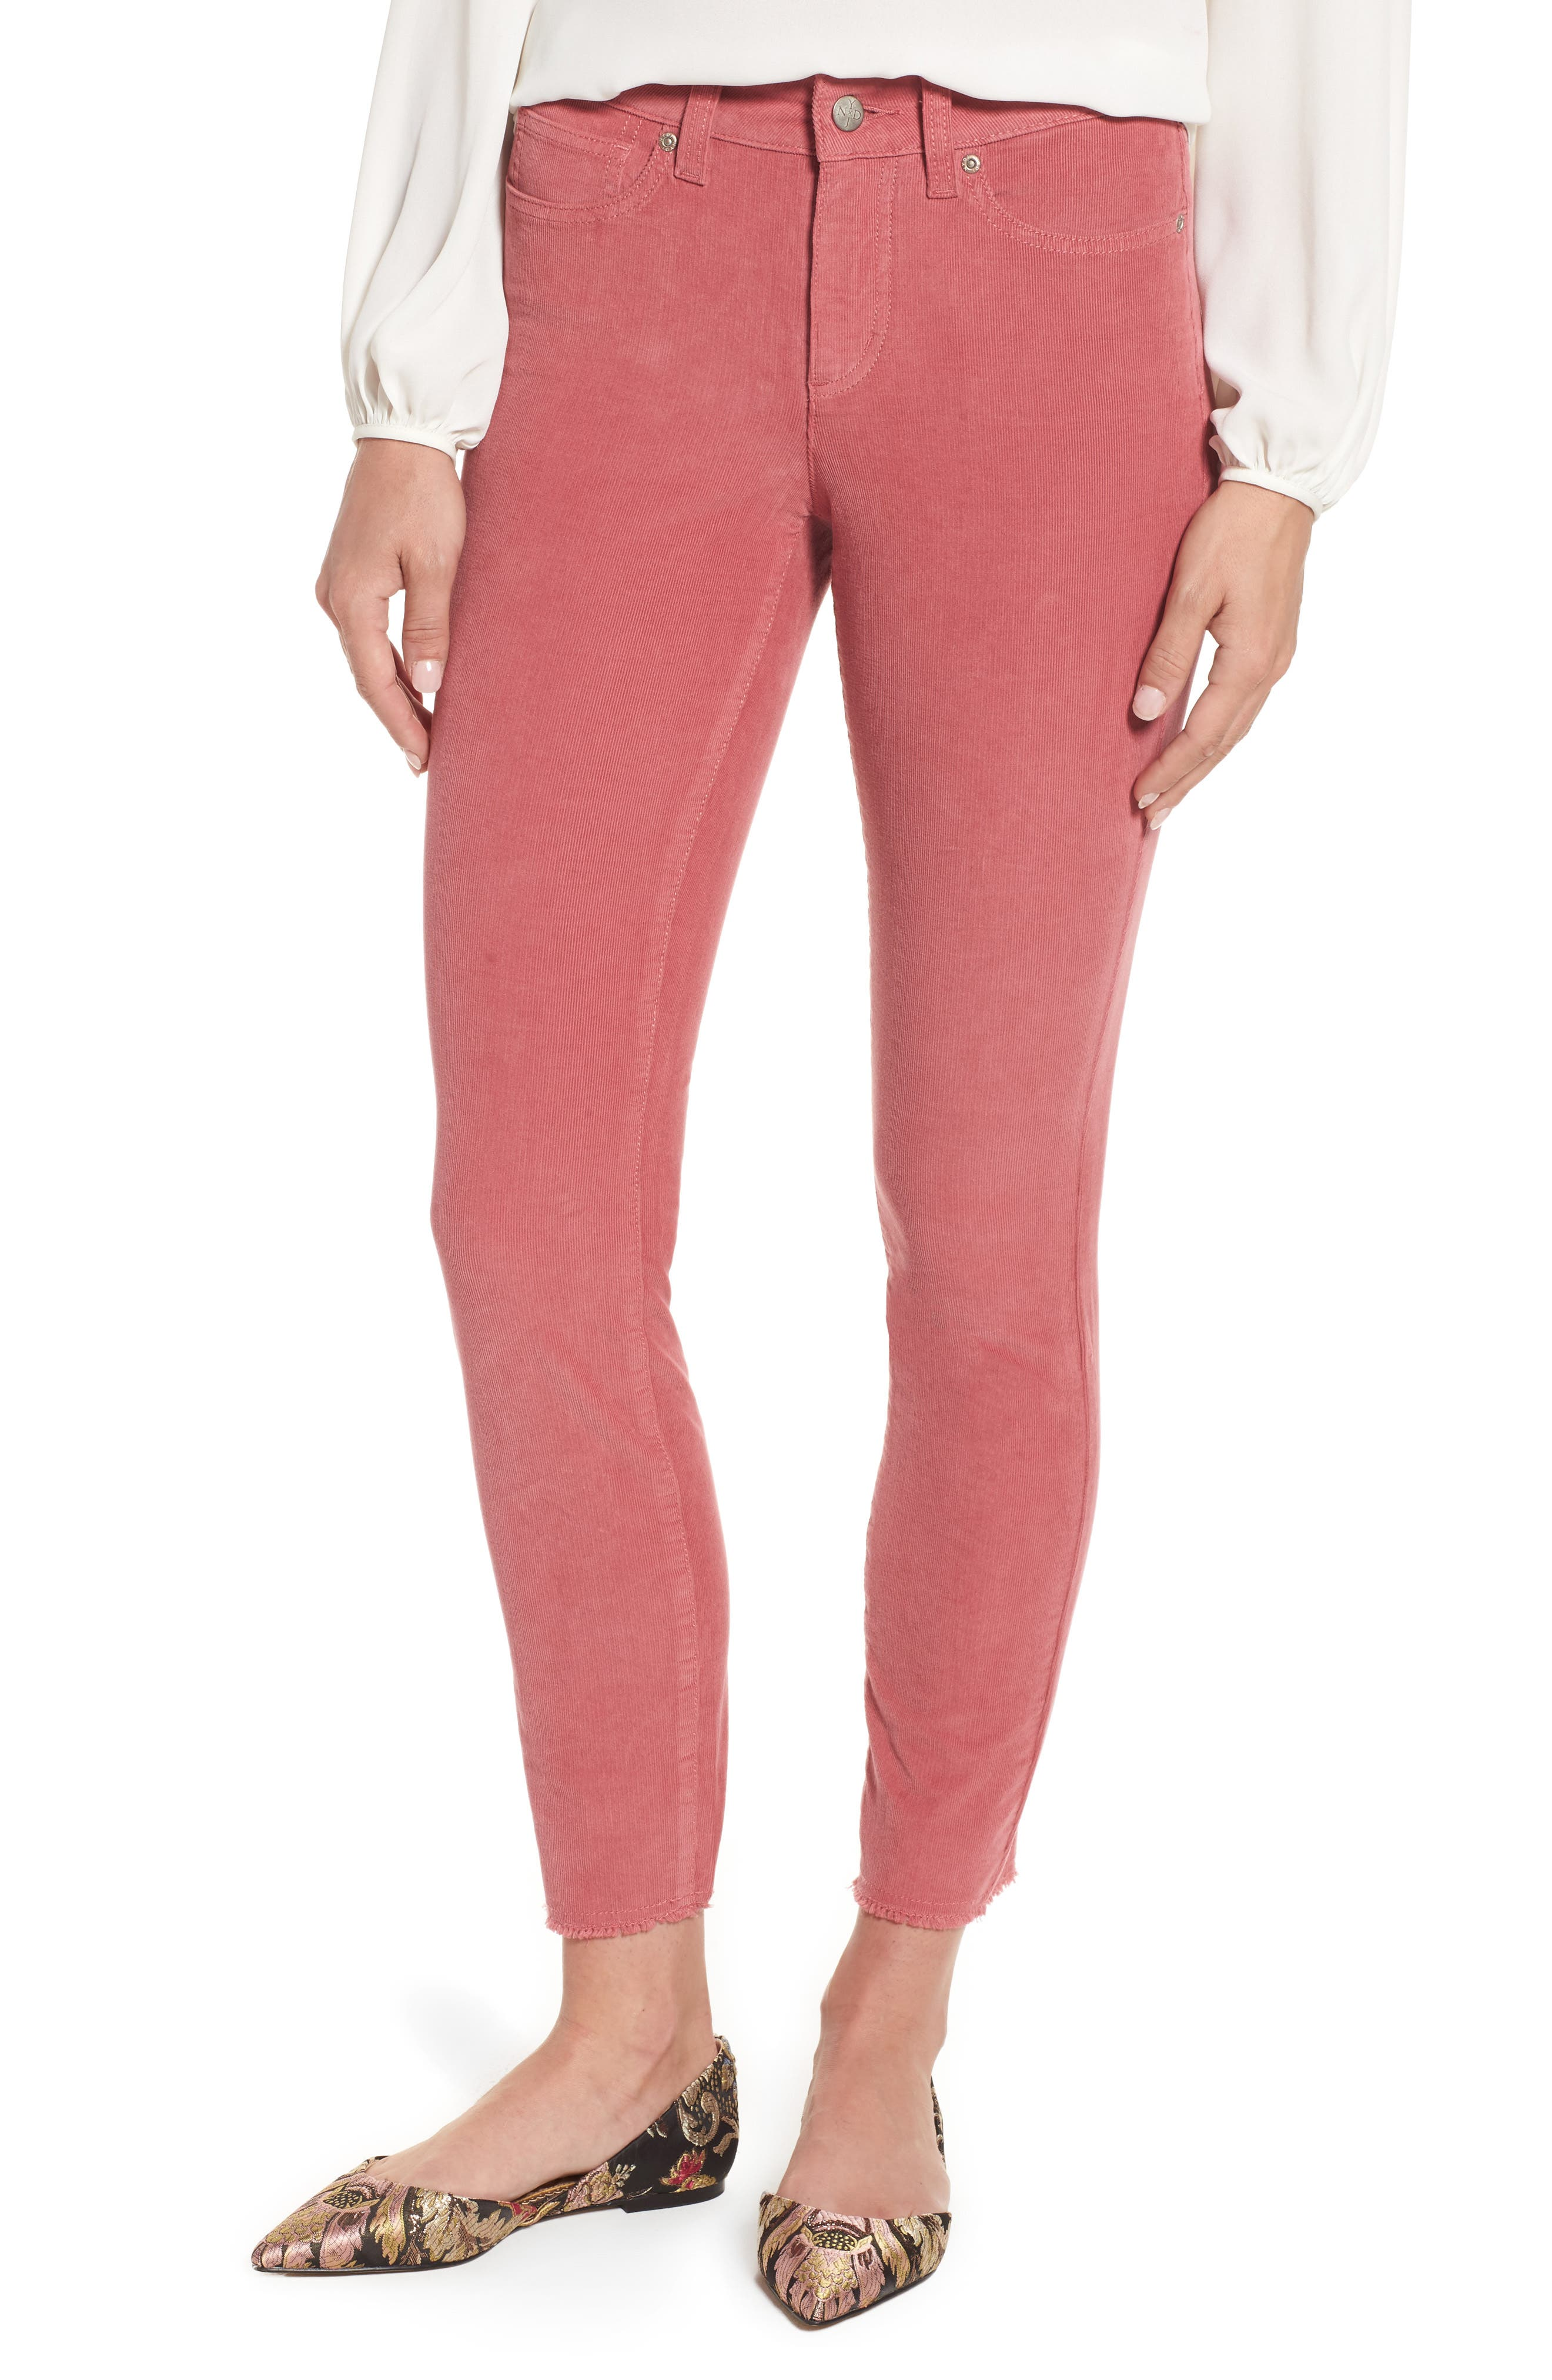 Main Image - NYDJ Alina Frayed Stretch Corduroy Ankle Jeans